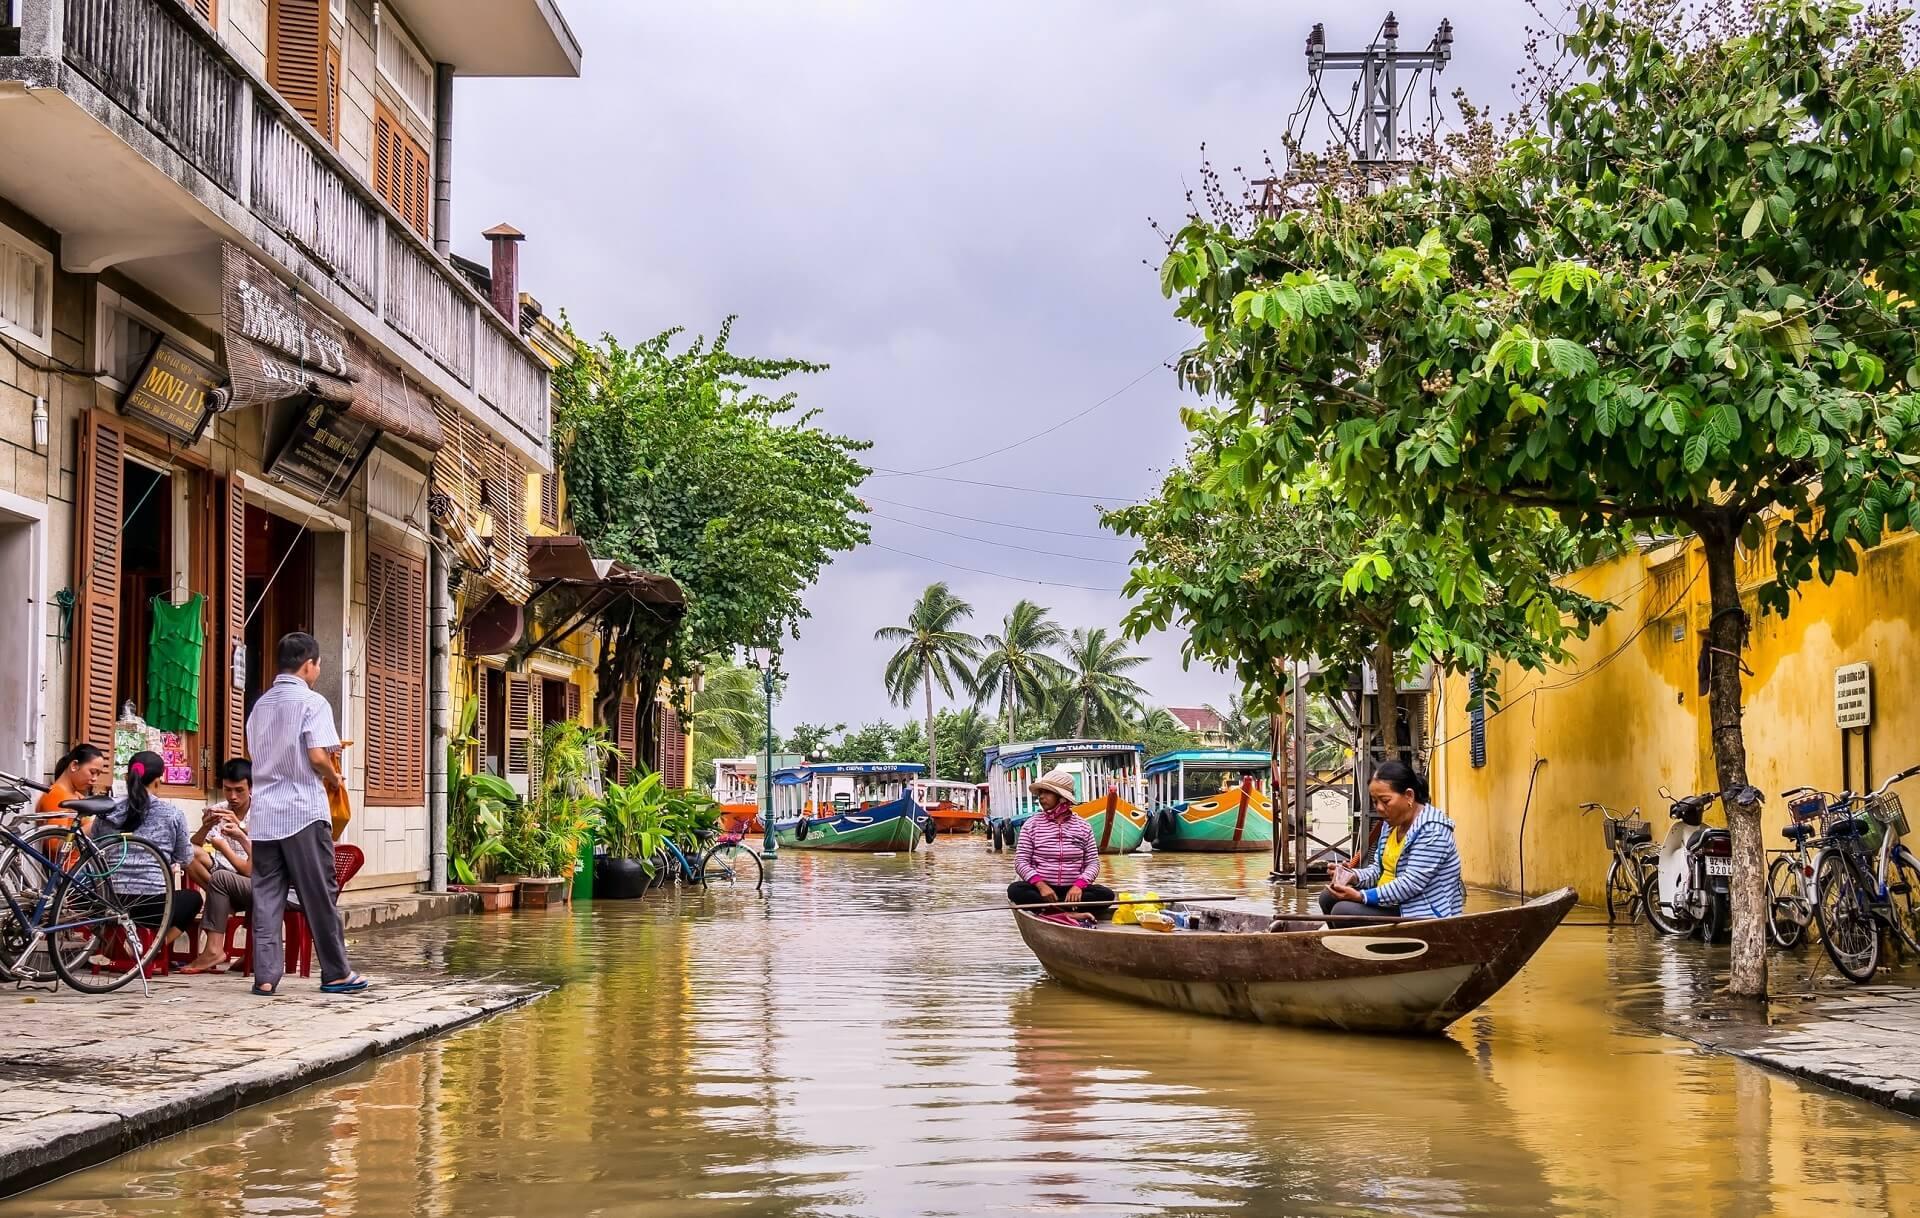 VIETNAM DIVERSITY AT EVERY STEP